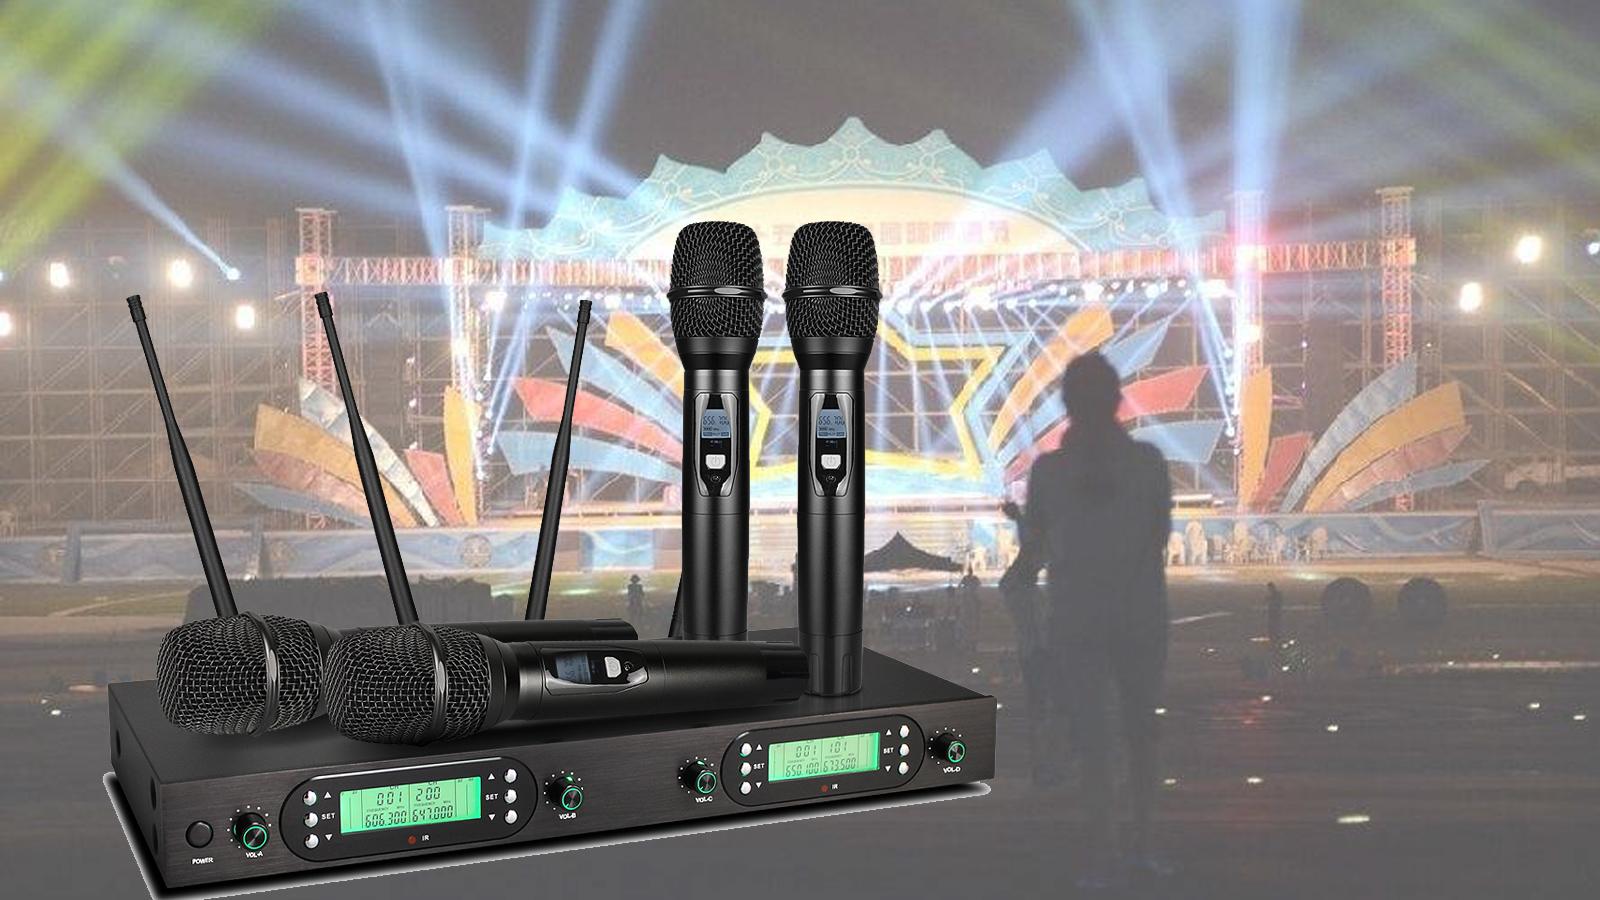 2020 Frekuensi Selestable Jarak Jauh Lapel Microphone Wireless 4 Channel Microphone Handheld